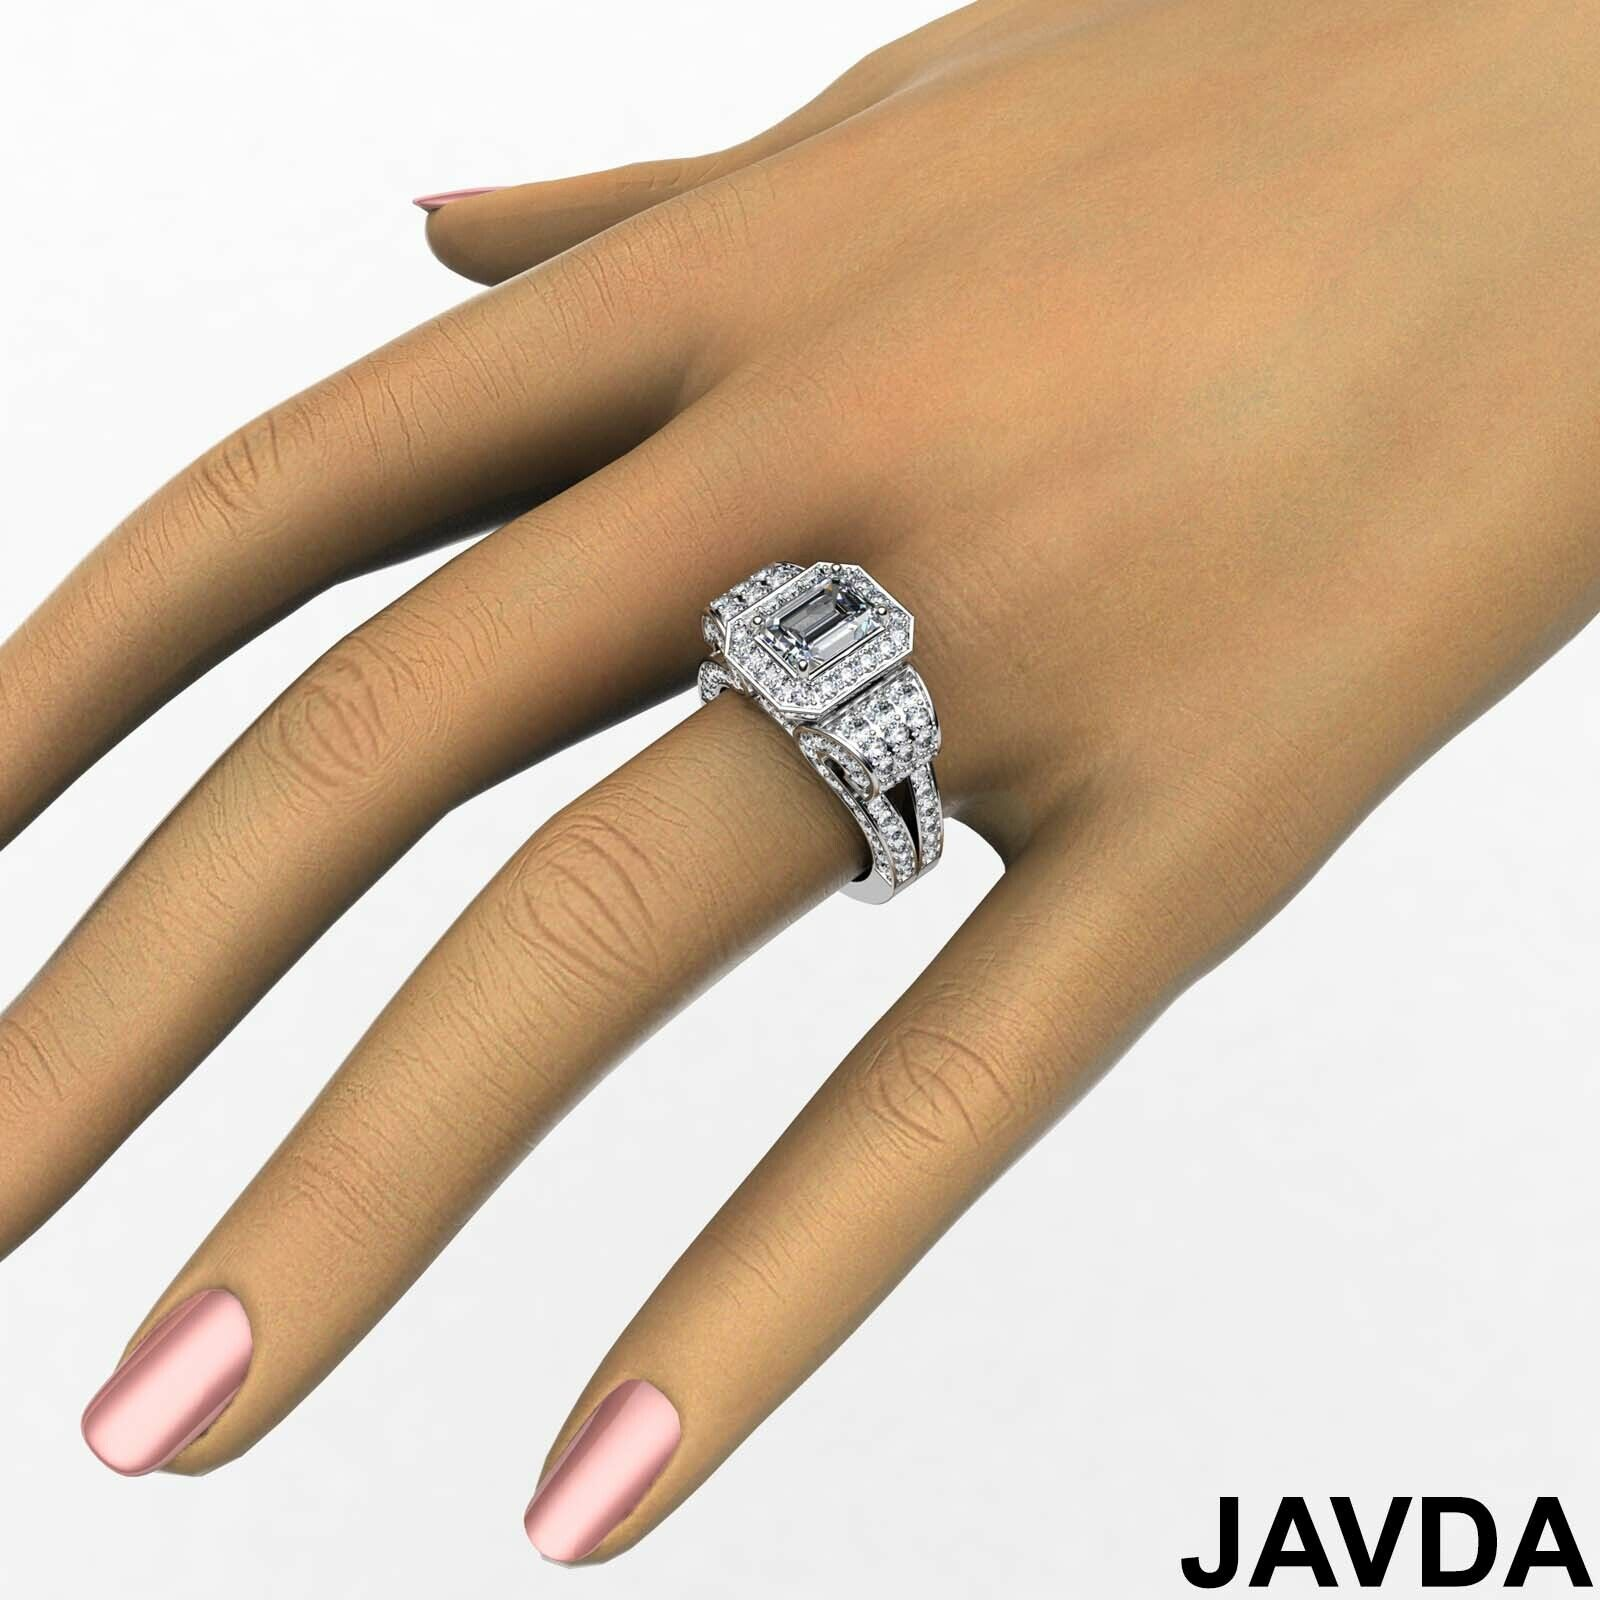 4.4ctw Antique Vintage Halo Emerald Diamond Engagement Ring GIA I-VS1 White Gold 4